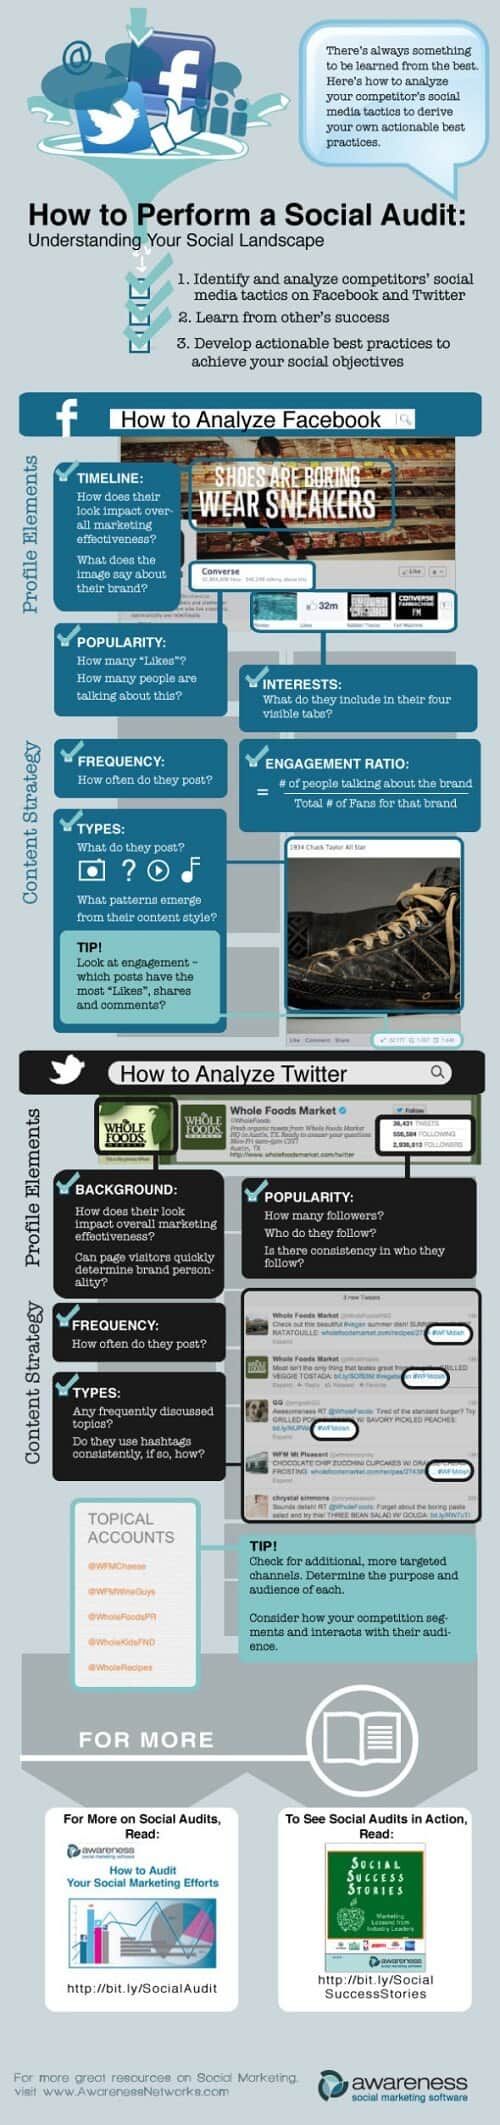 Auditoría de social media #infografía